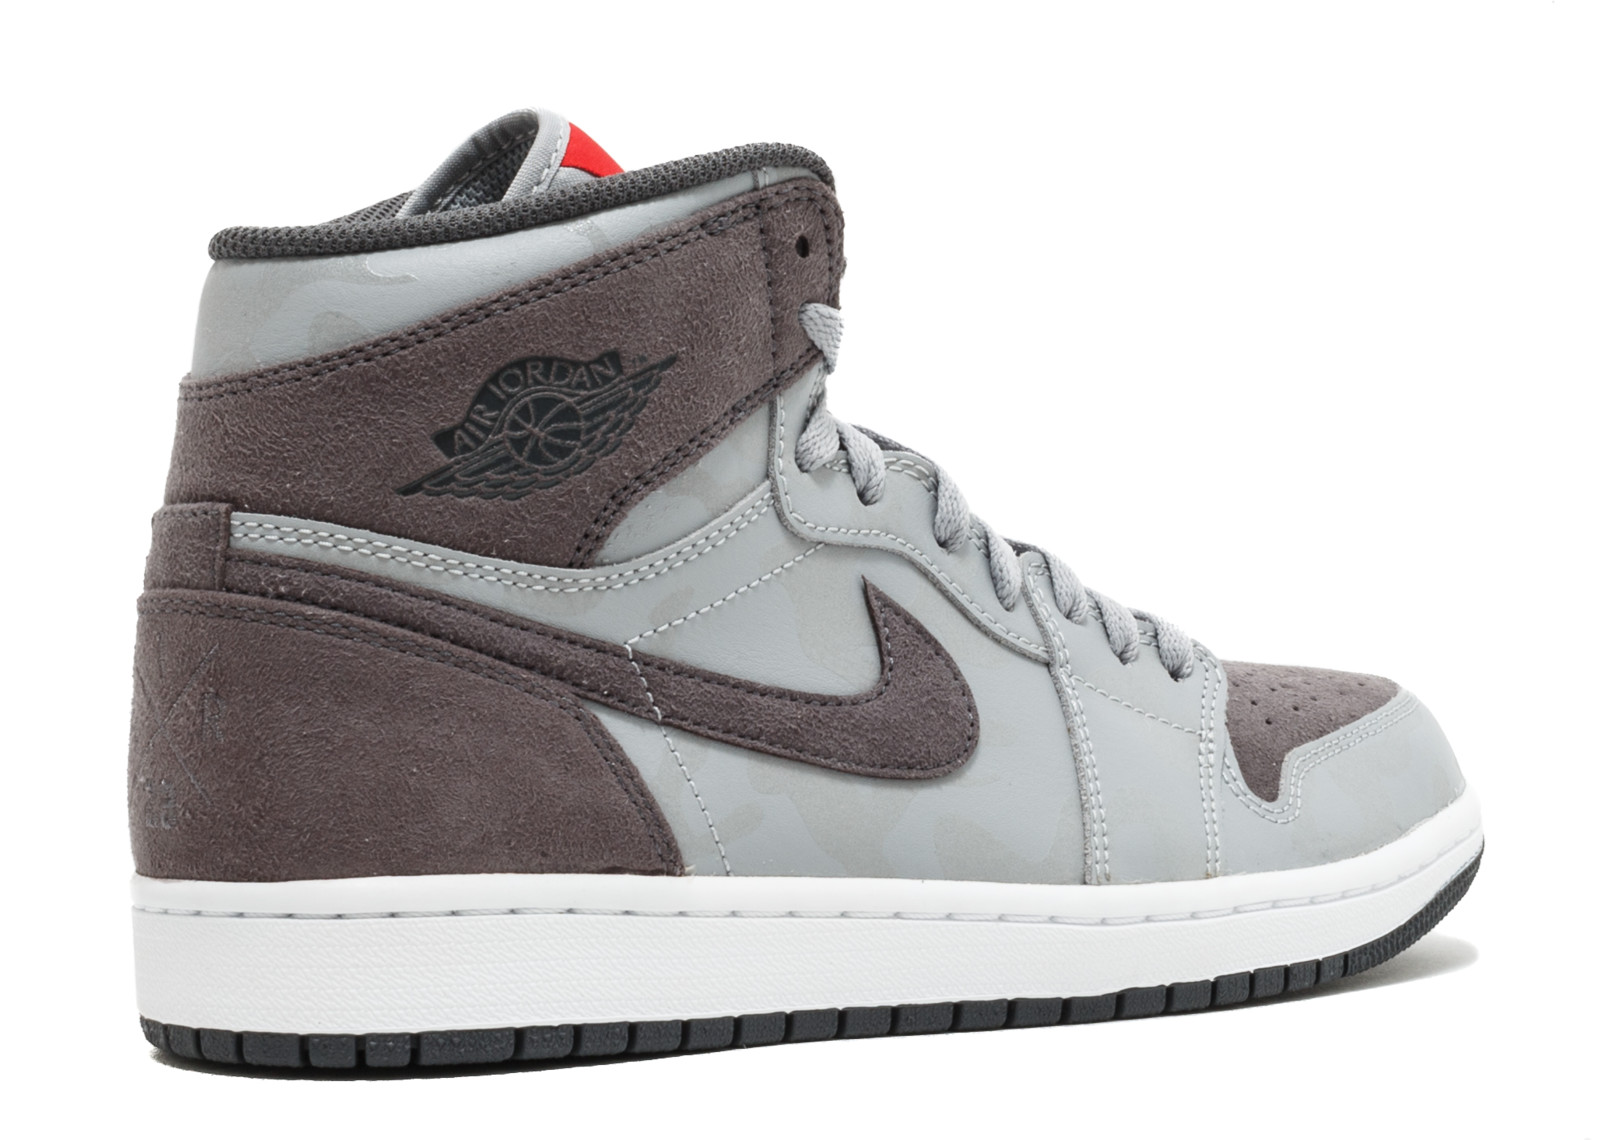 Mens Air Jordan 1 Retro High Premium Grey Camo Wolf Grey Dark Grey Whi